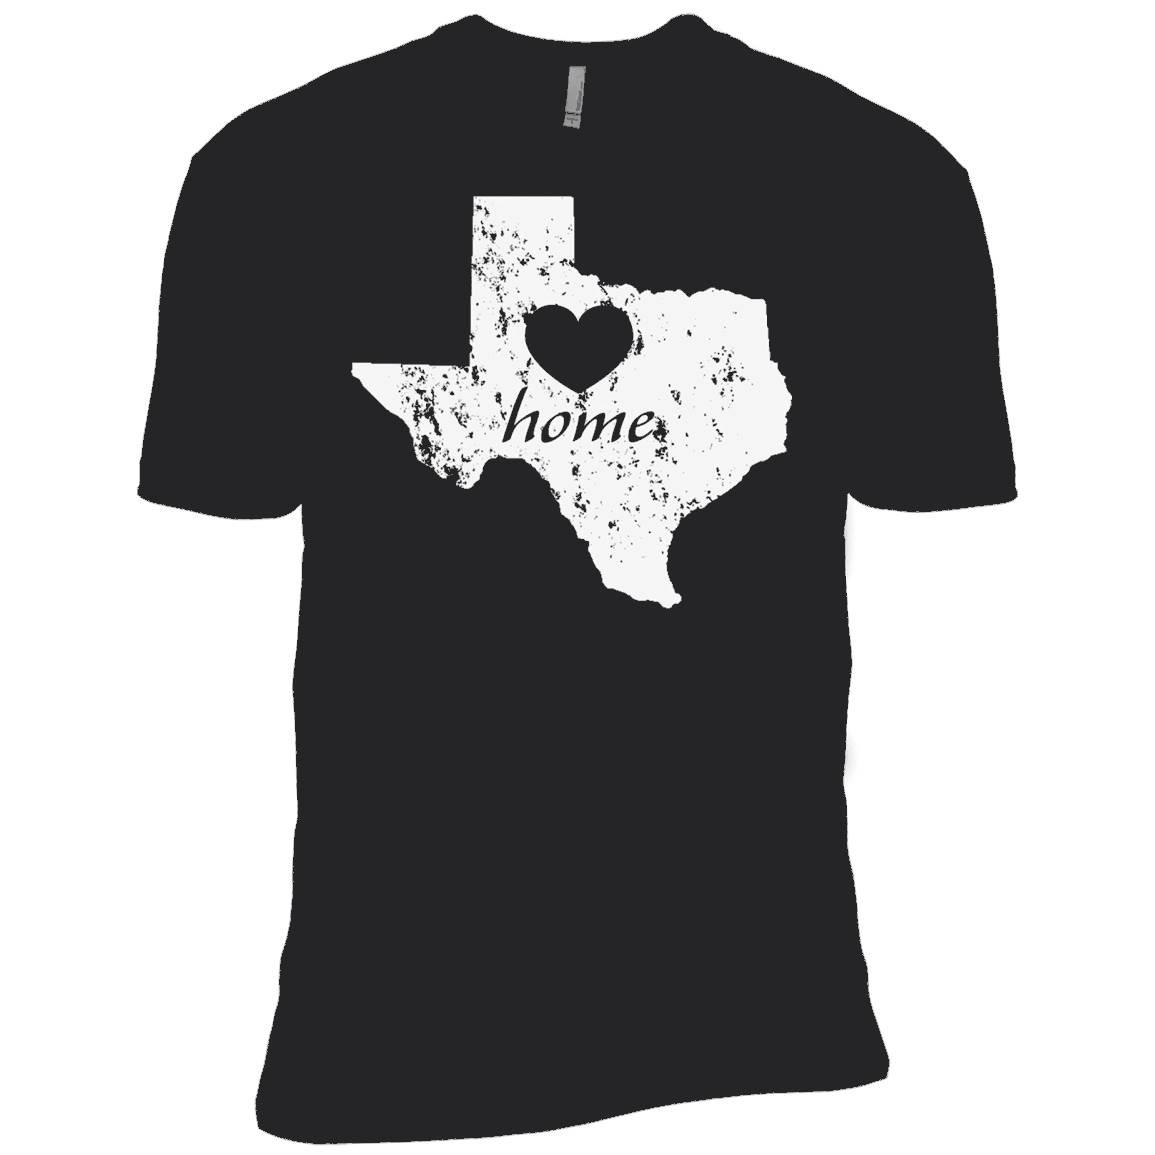 I Love Texas Home TShirt Texas Gifts (Men, Women, Youth) – T-Shirt